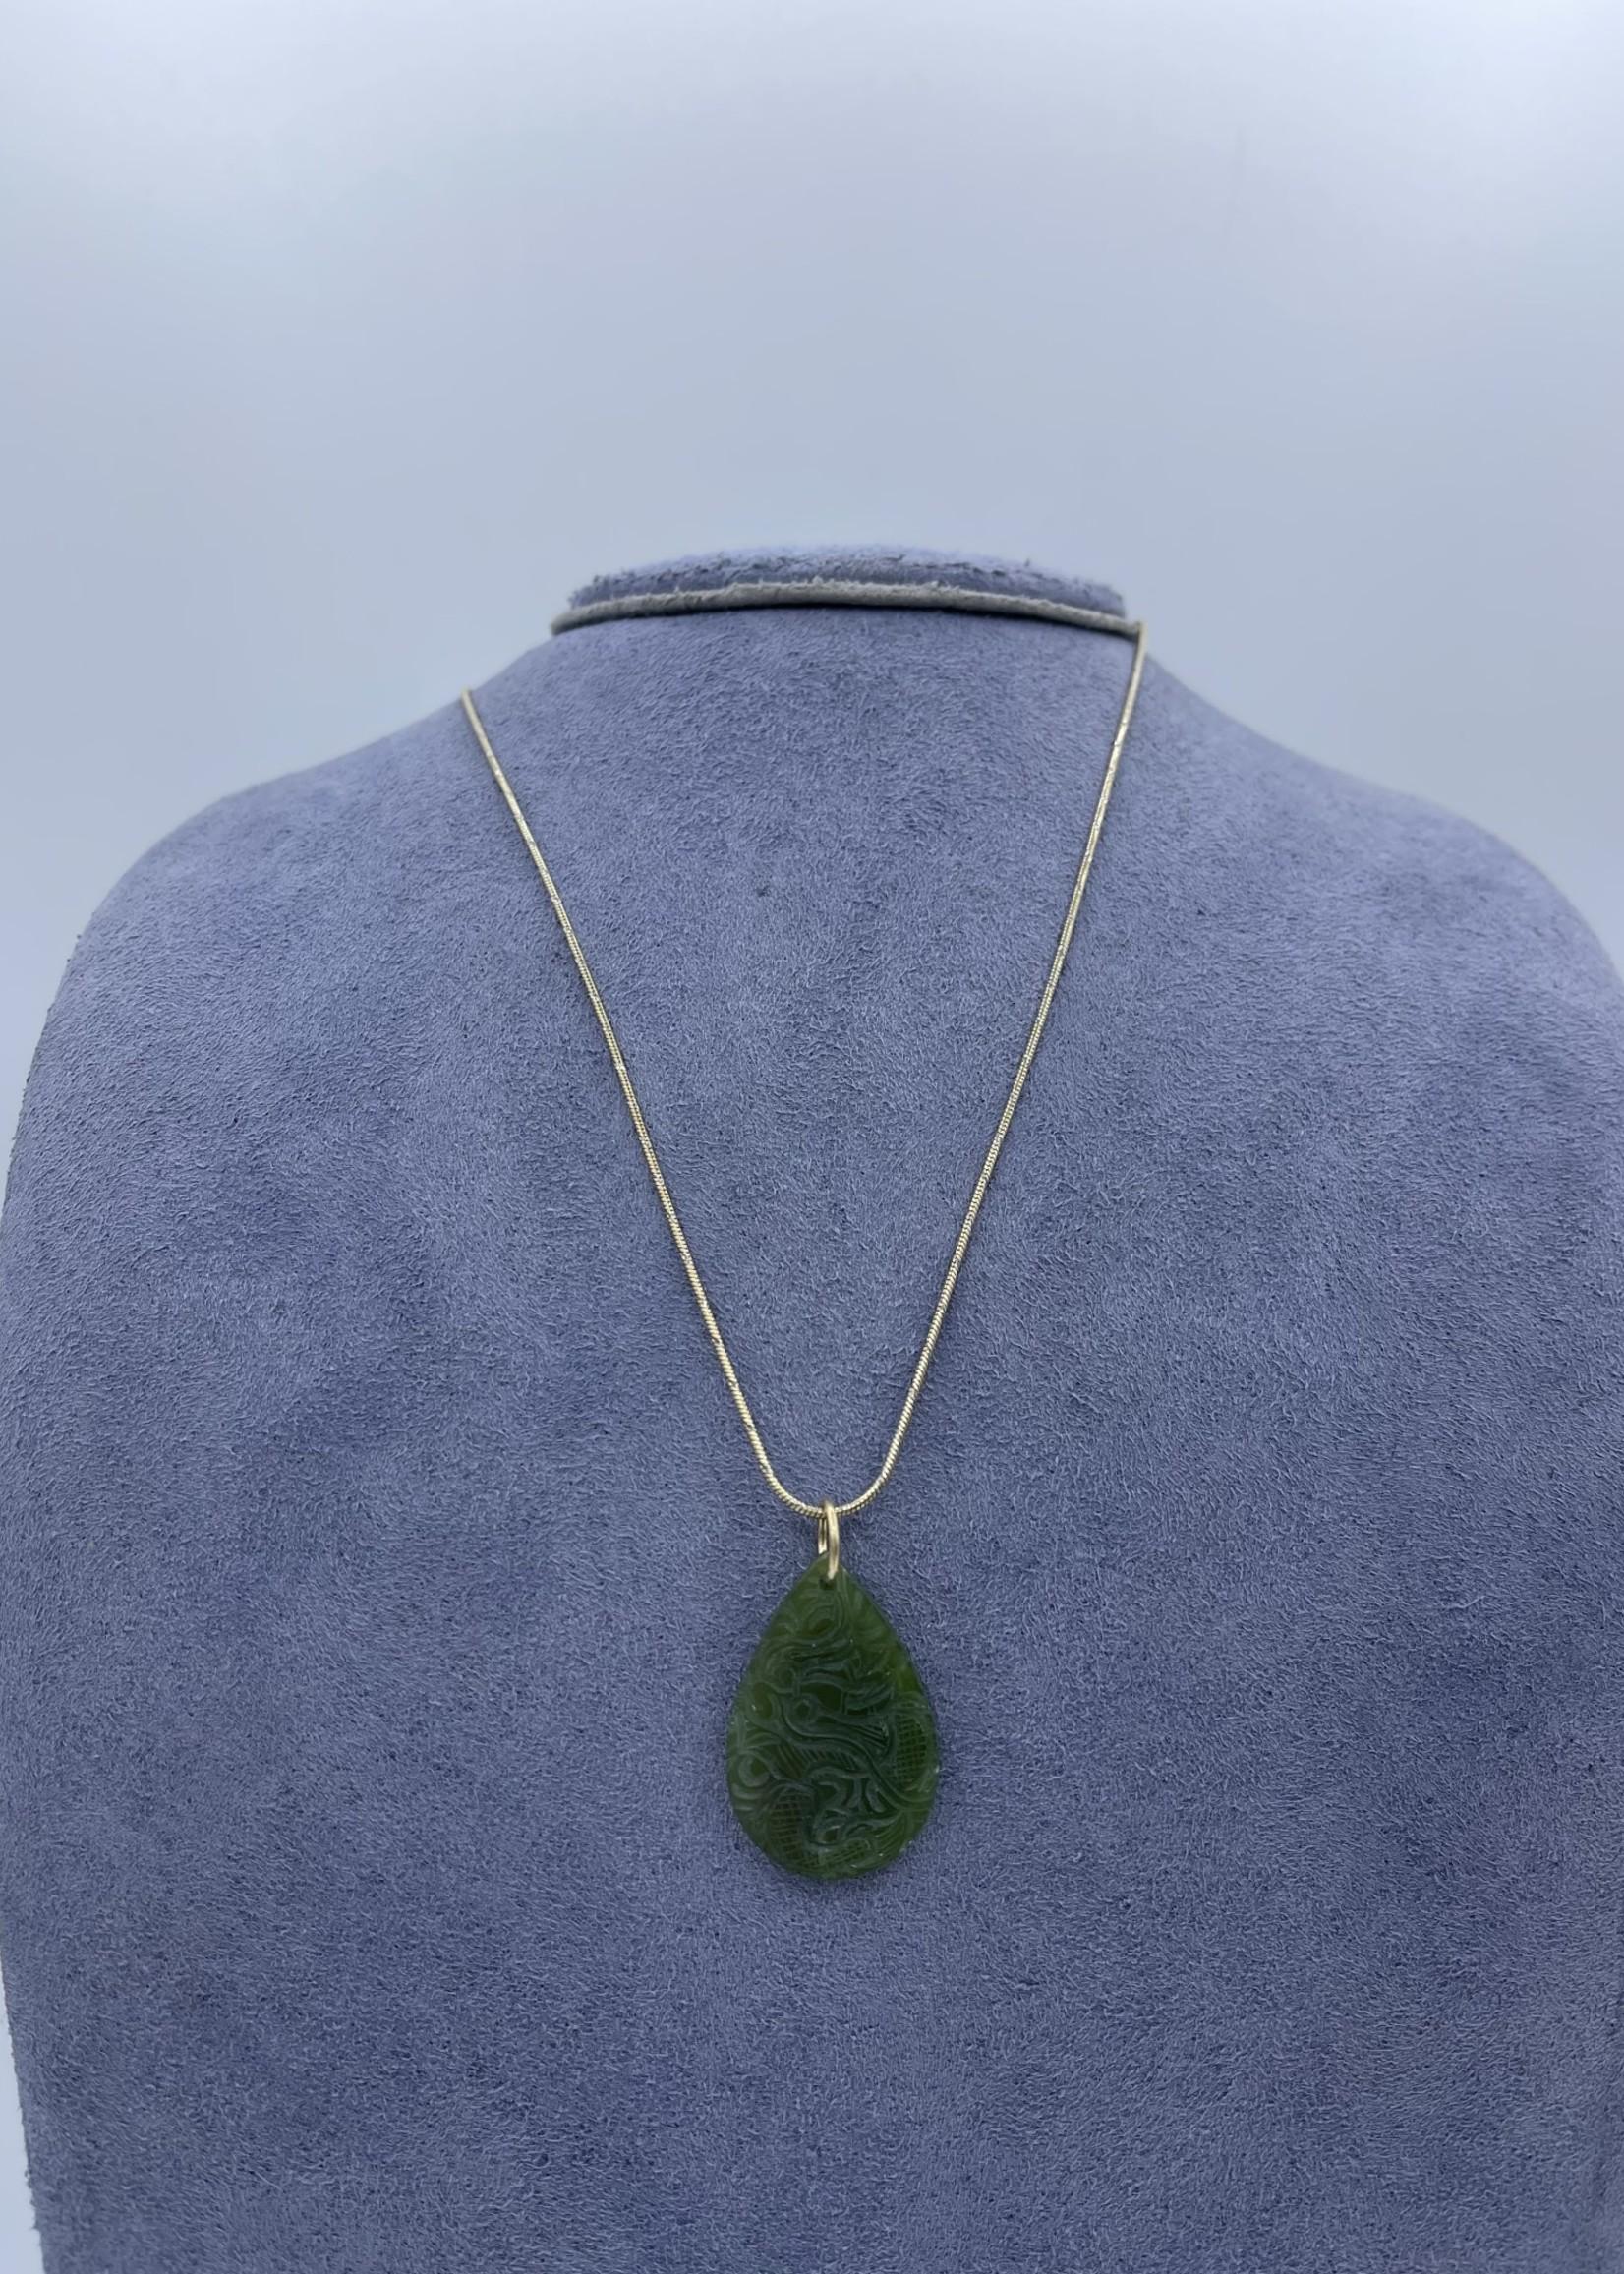 CJ Designs Gold Jade Stone Pendant